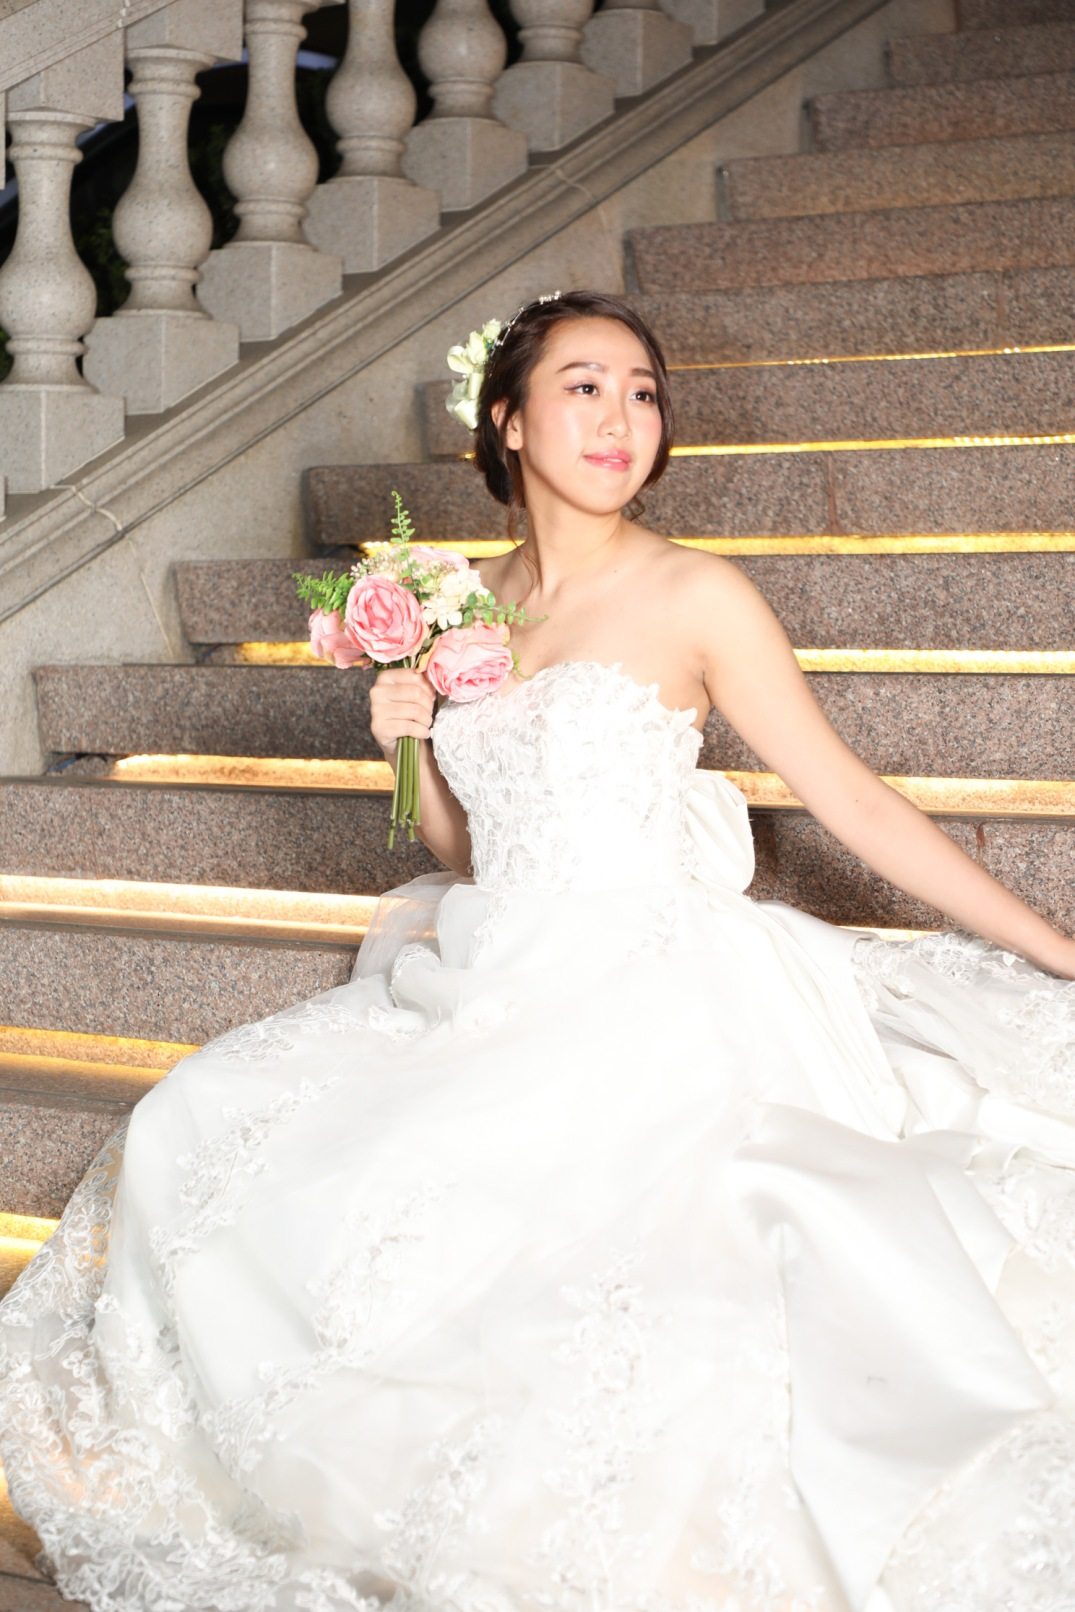 wedding big day photography hk 攝影價錢 香港婚禮攝影推薦 coolstylist-28